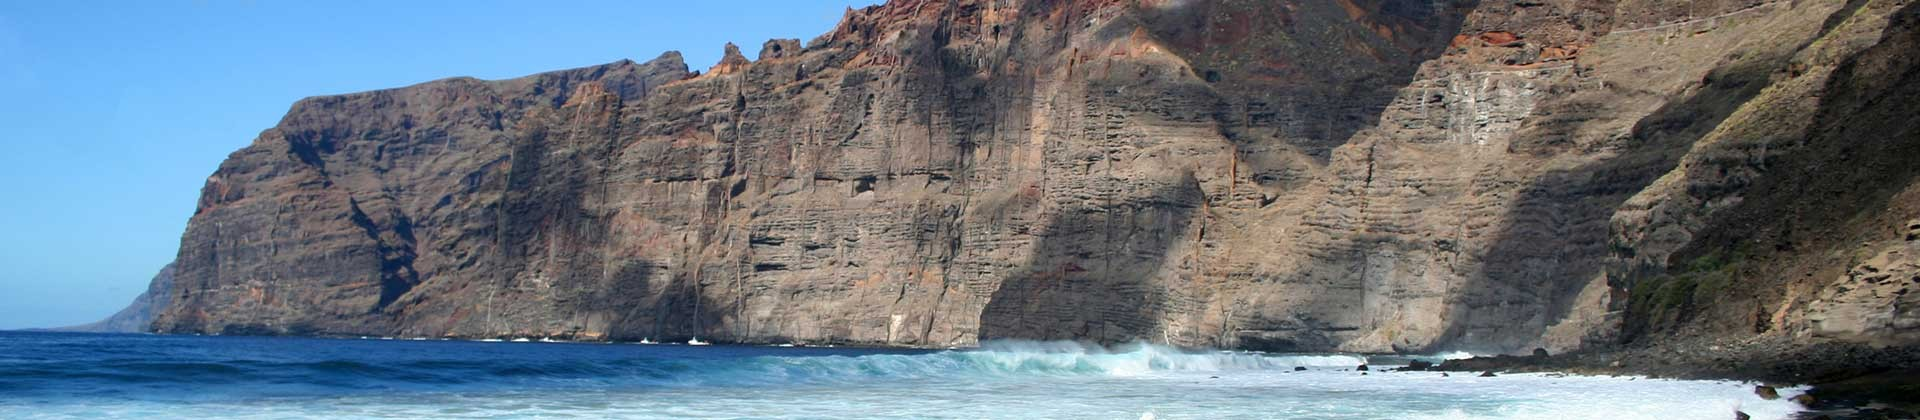 https://www.goodmorningtenerife.com/wp-content/uploads/2014/08/03_slide_los_gigantes_GM_Tenerife-1920x420.jpg